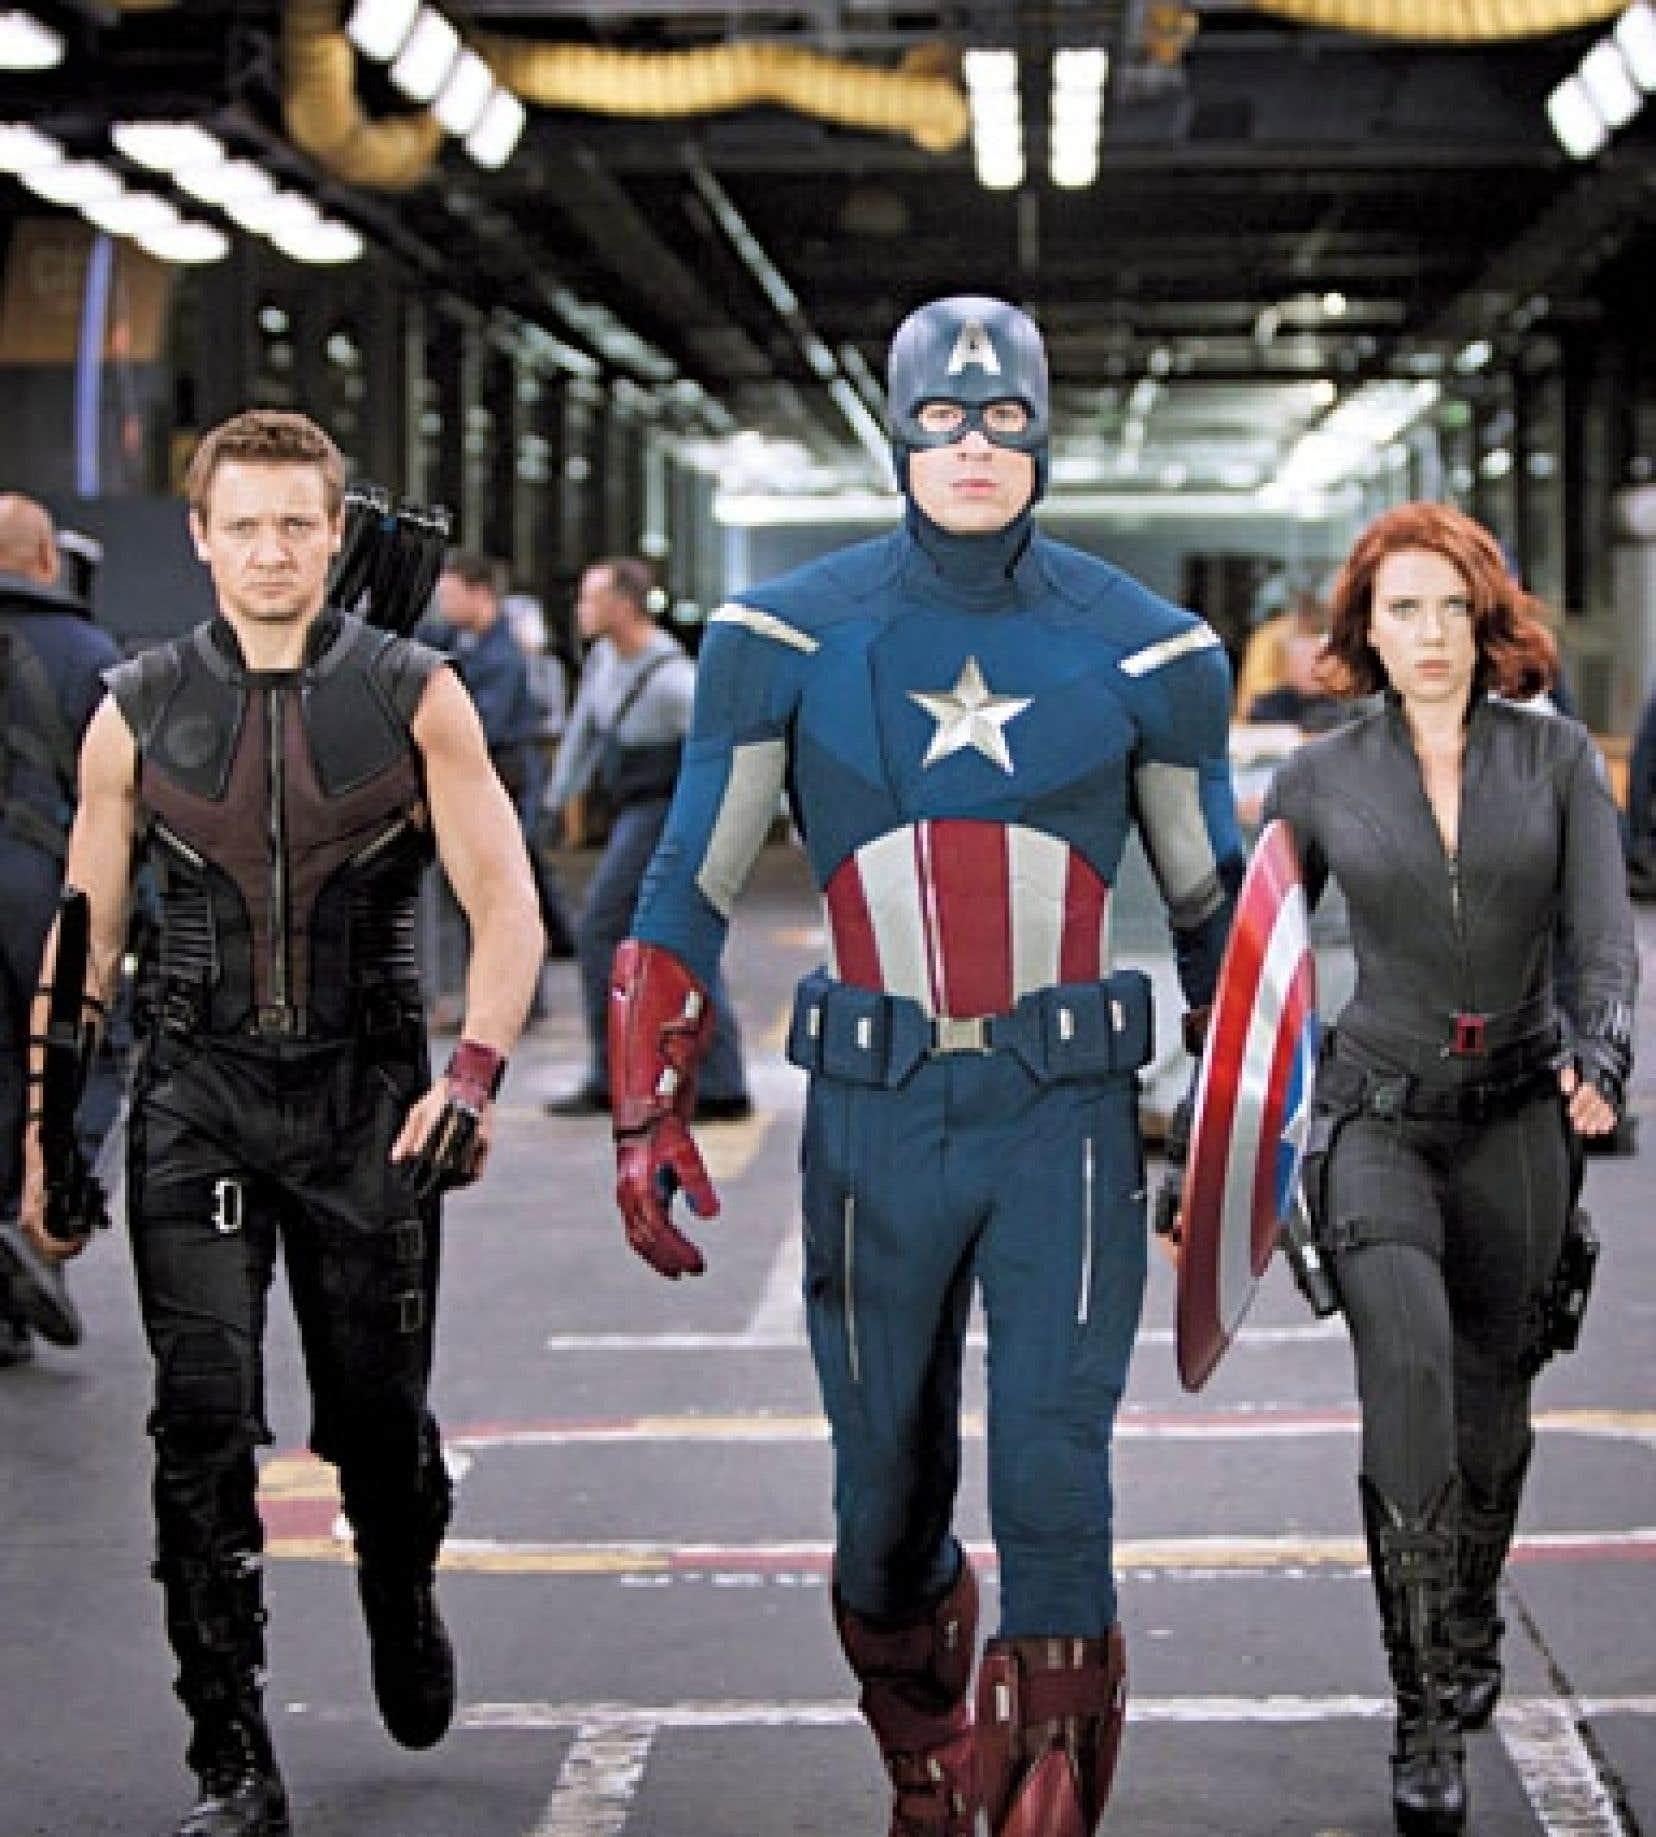 Hawkeye, Captain America et Black Widow, superhéros du blockbuster Les Avengers.